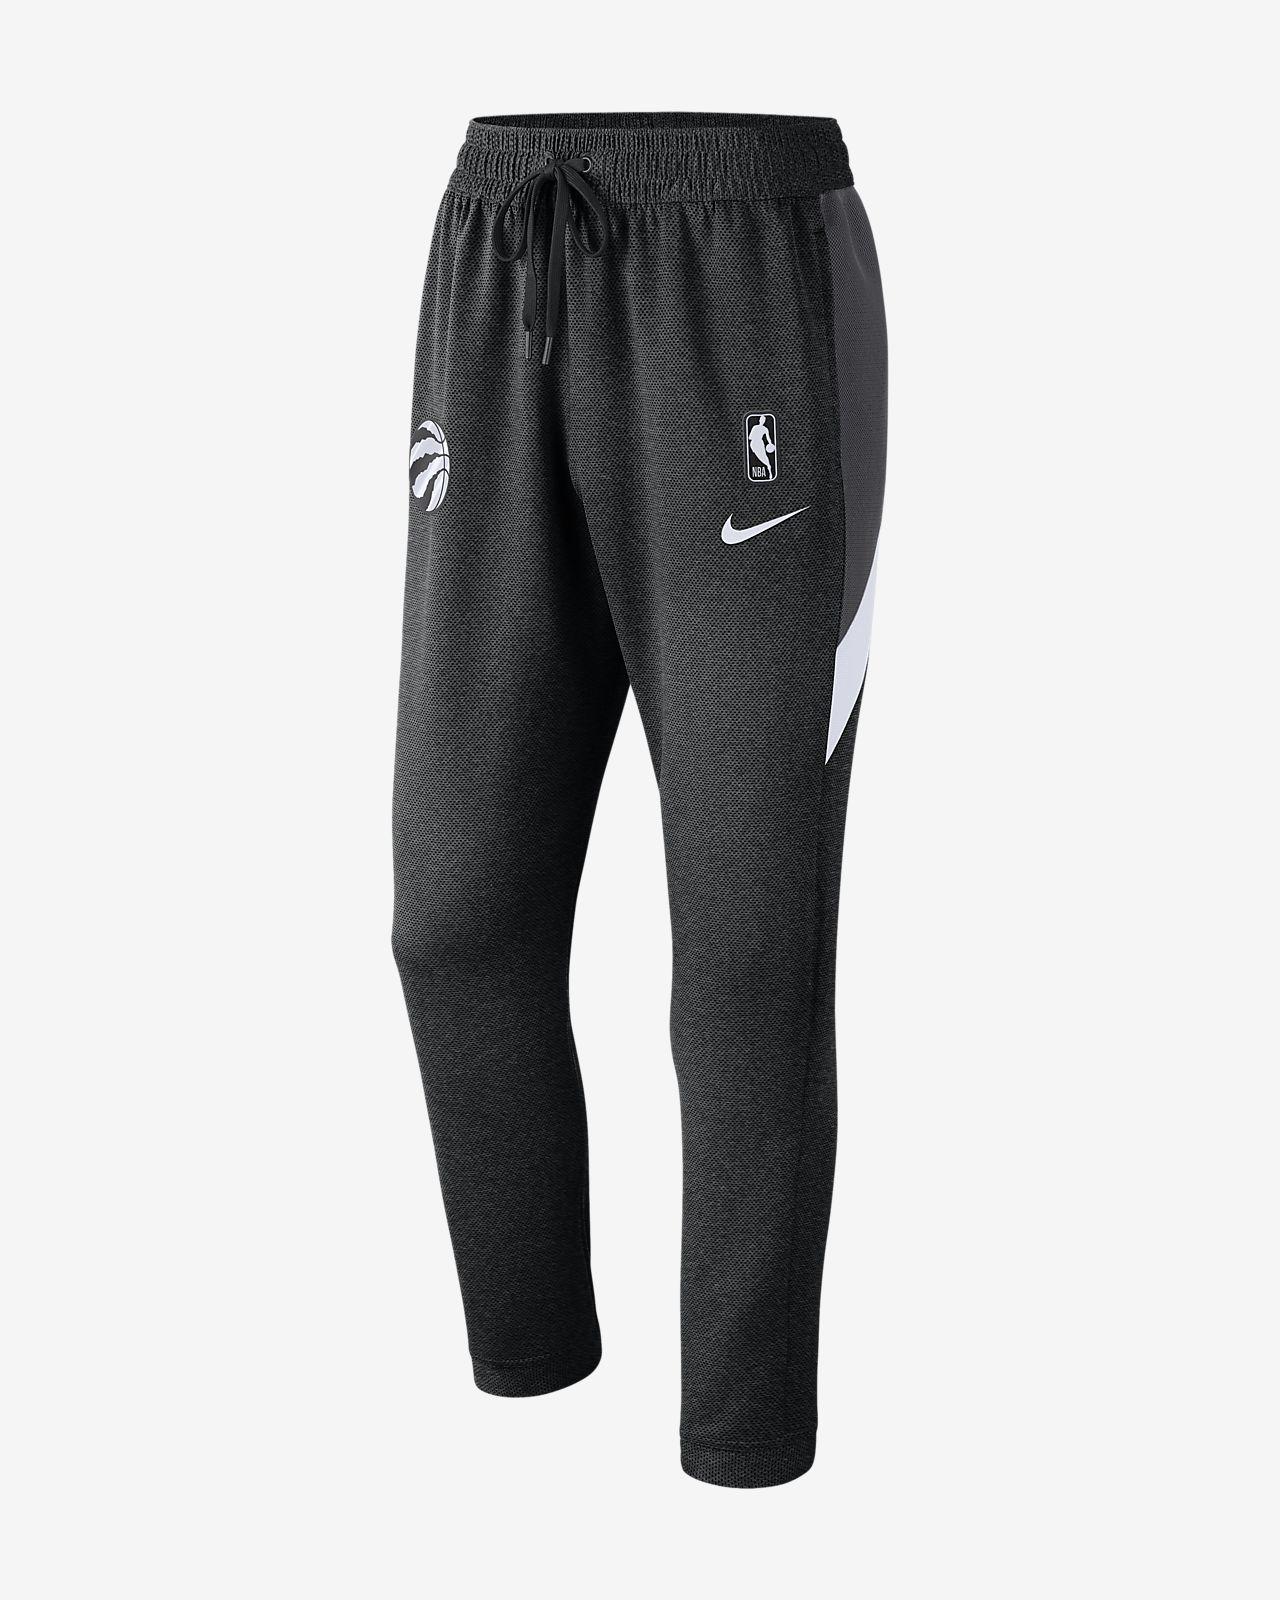 Pantalon NBA Toronto Raptors Nike Therma Flex Showtime pour Homme